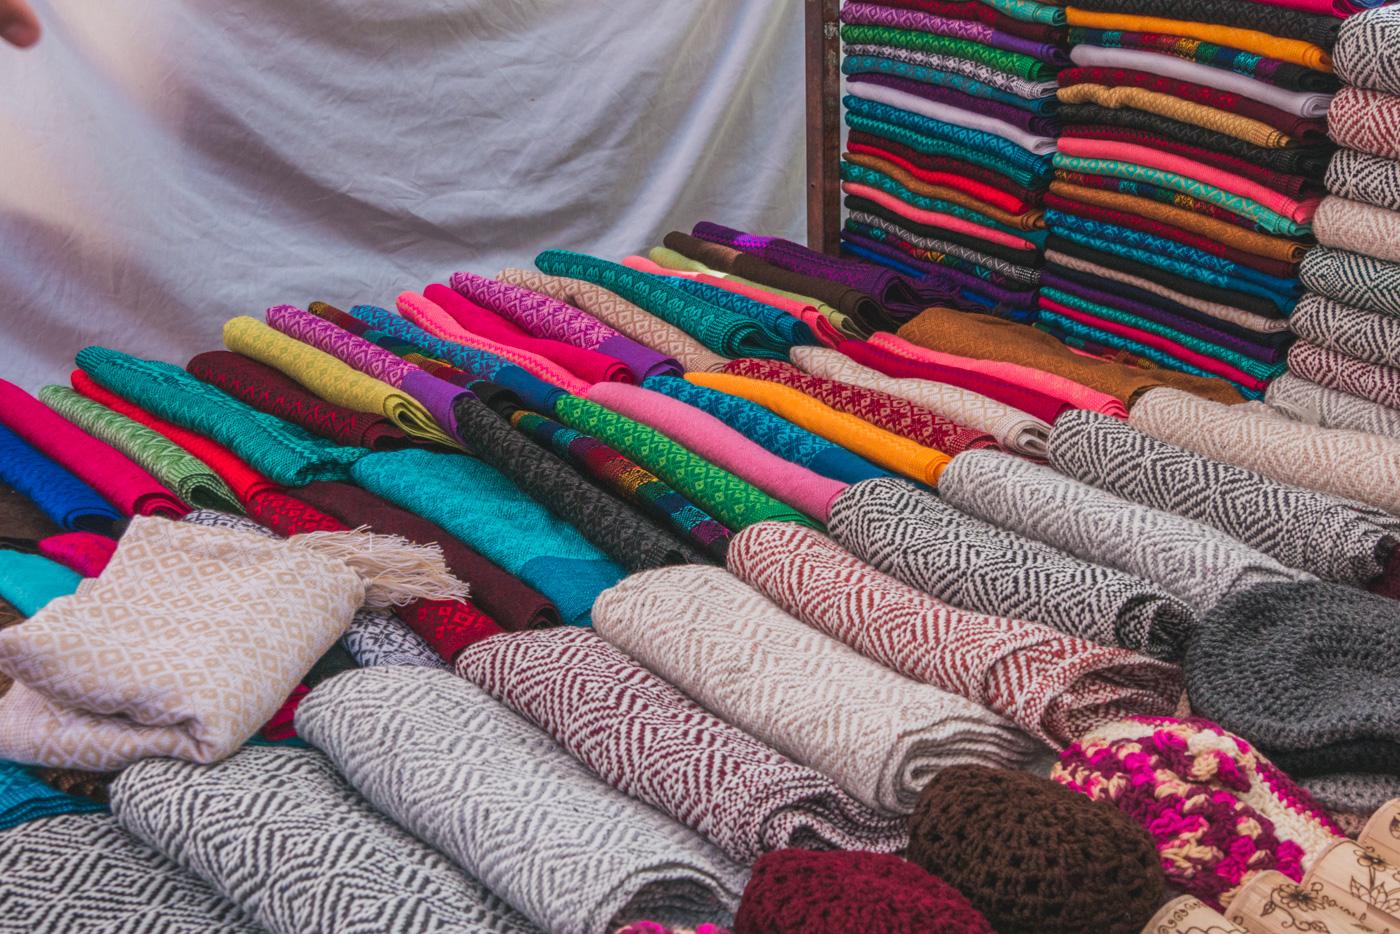 Tücher auf dem Mercado Santo Domingo in San Cristobal